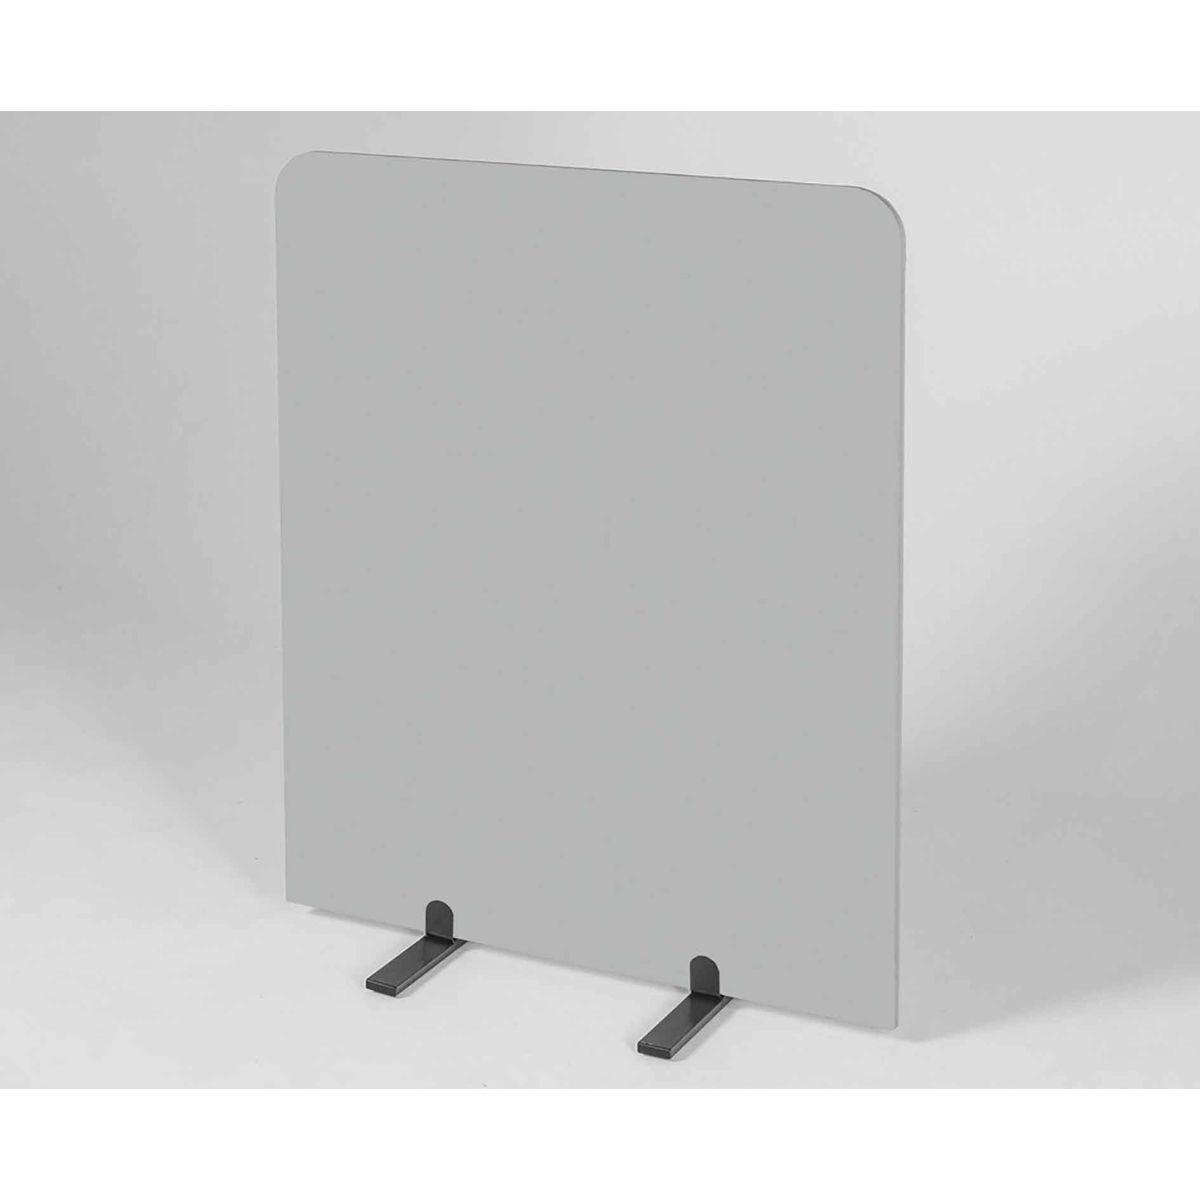 Metroplan BusyScreen Curve Screen 1200 x 1200mm Light Grey